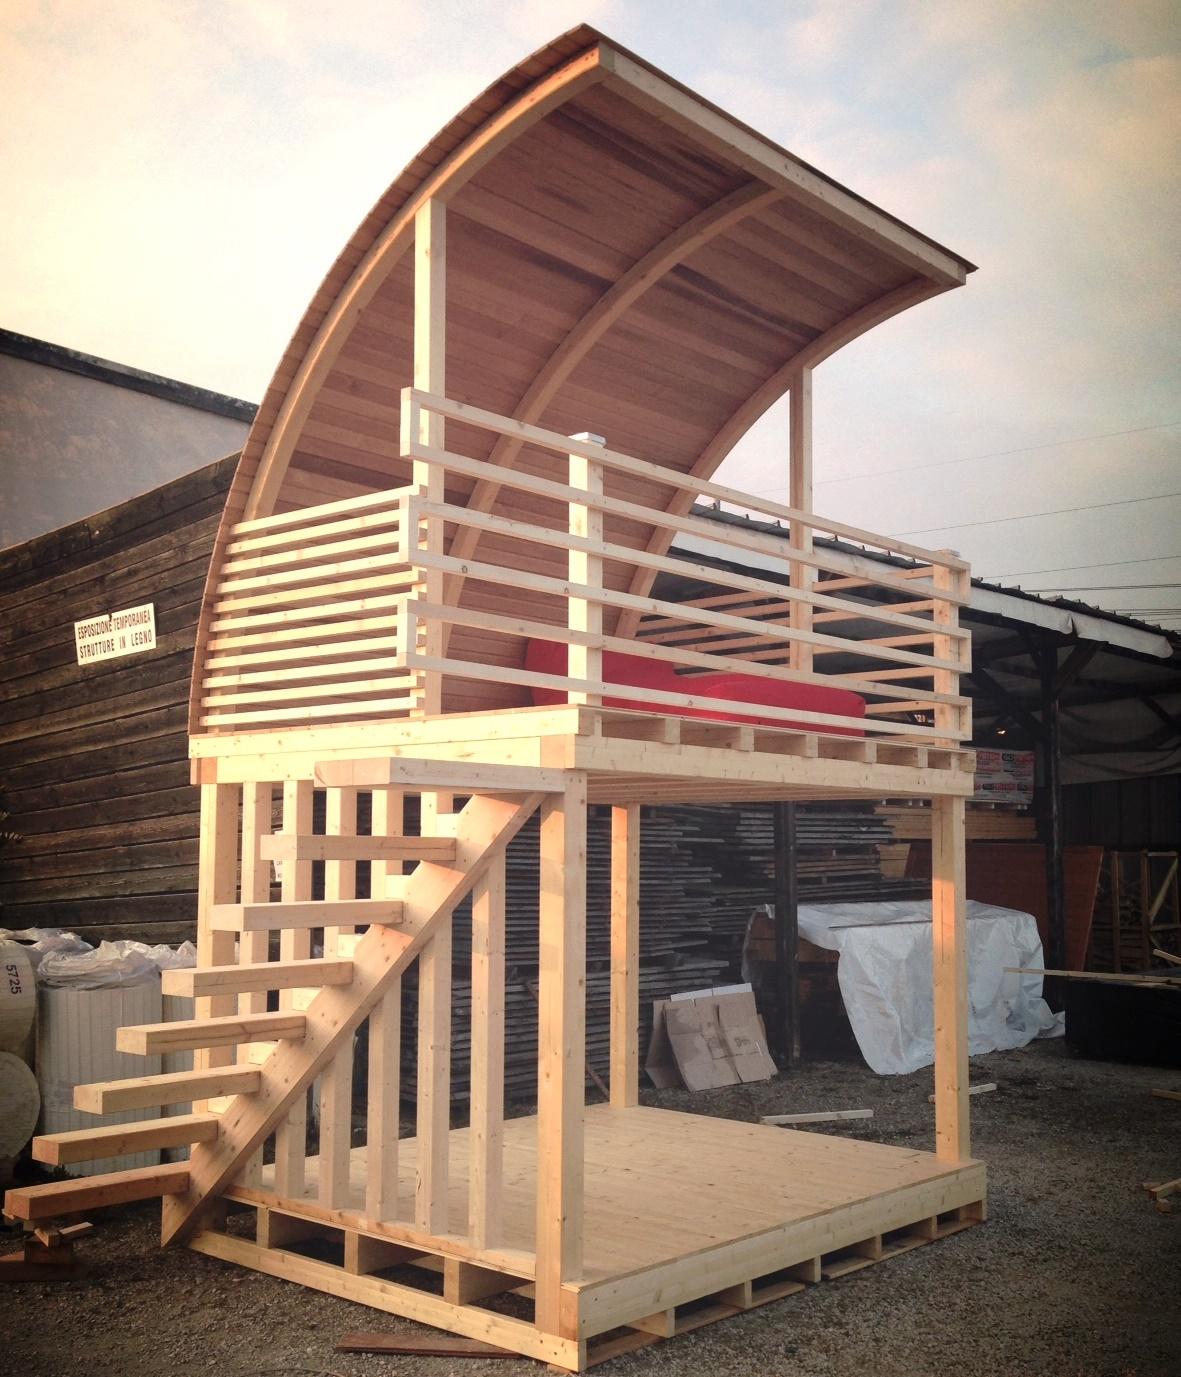 Casette prefabbricate in legno case in legno abitabili for Casette in legno abitabili